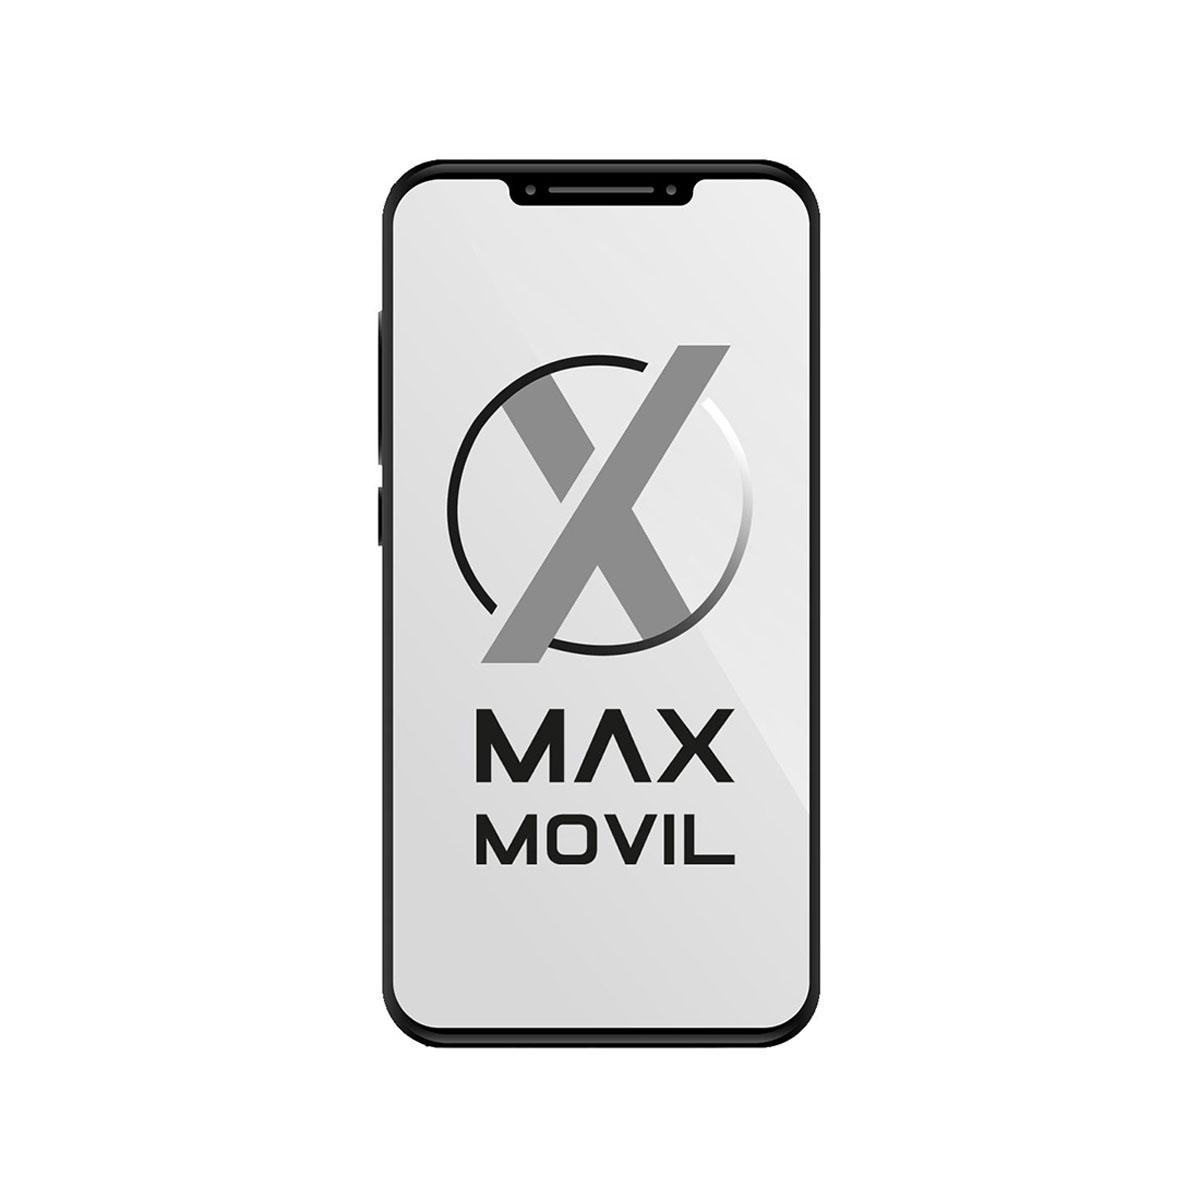 Protector de cristal templado para iPhone XS Max con marco negro